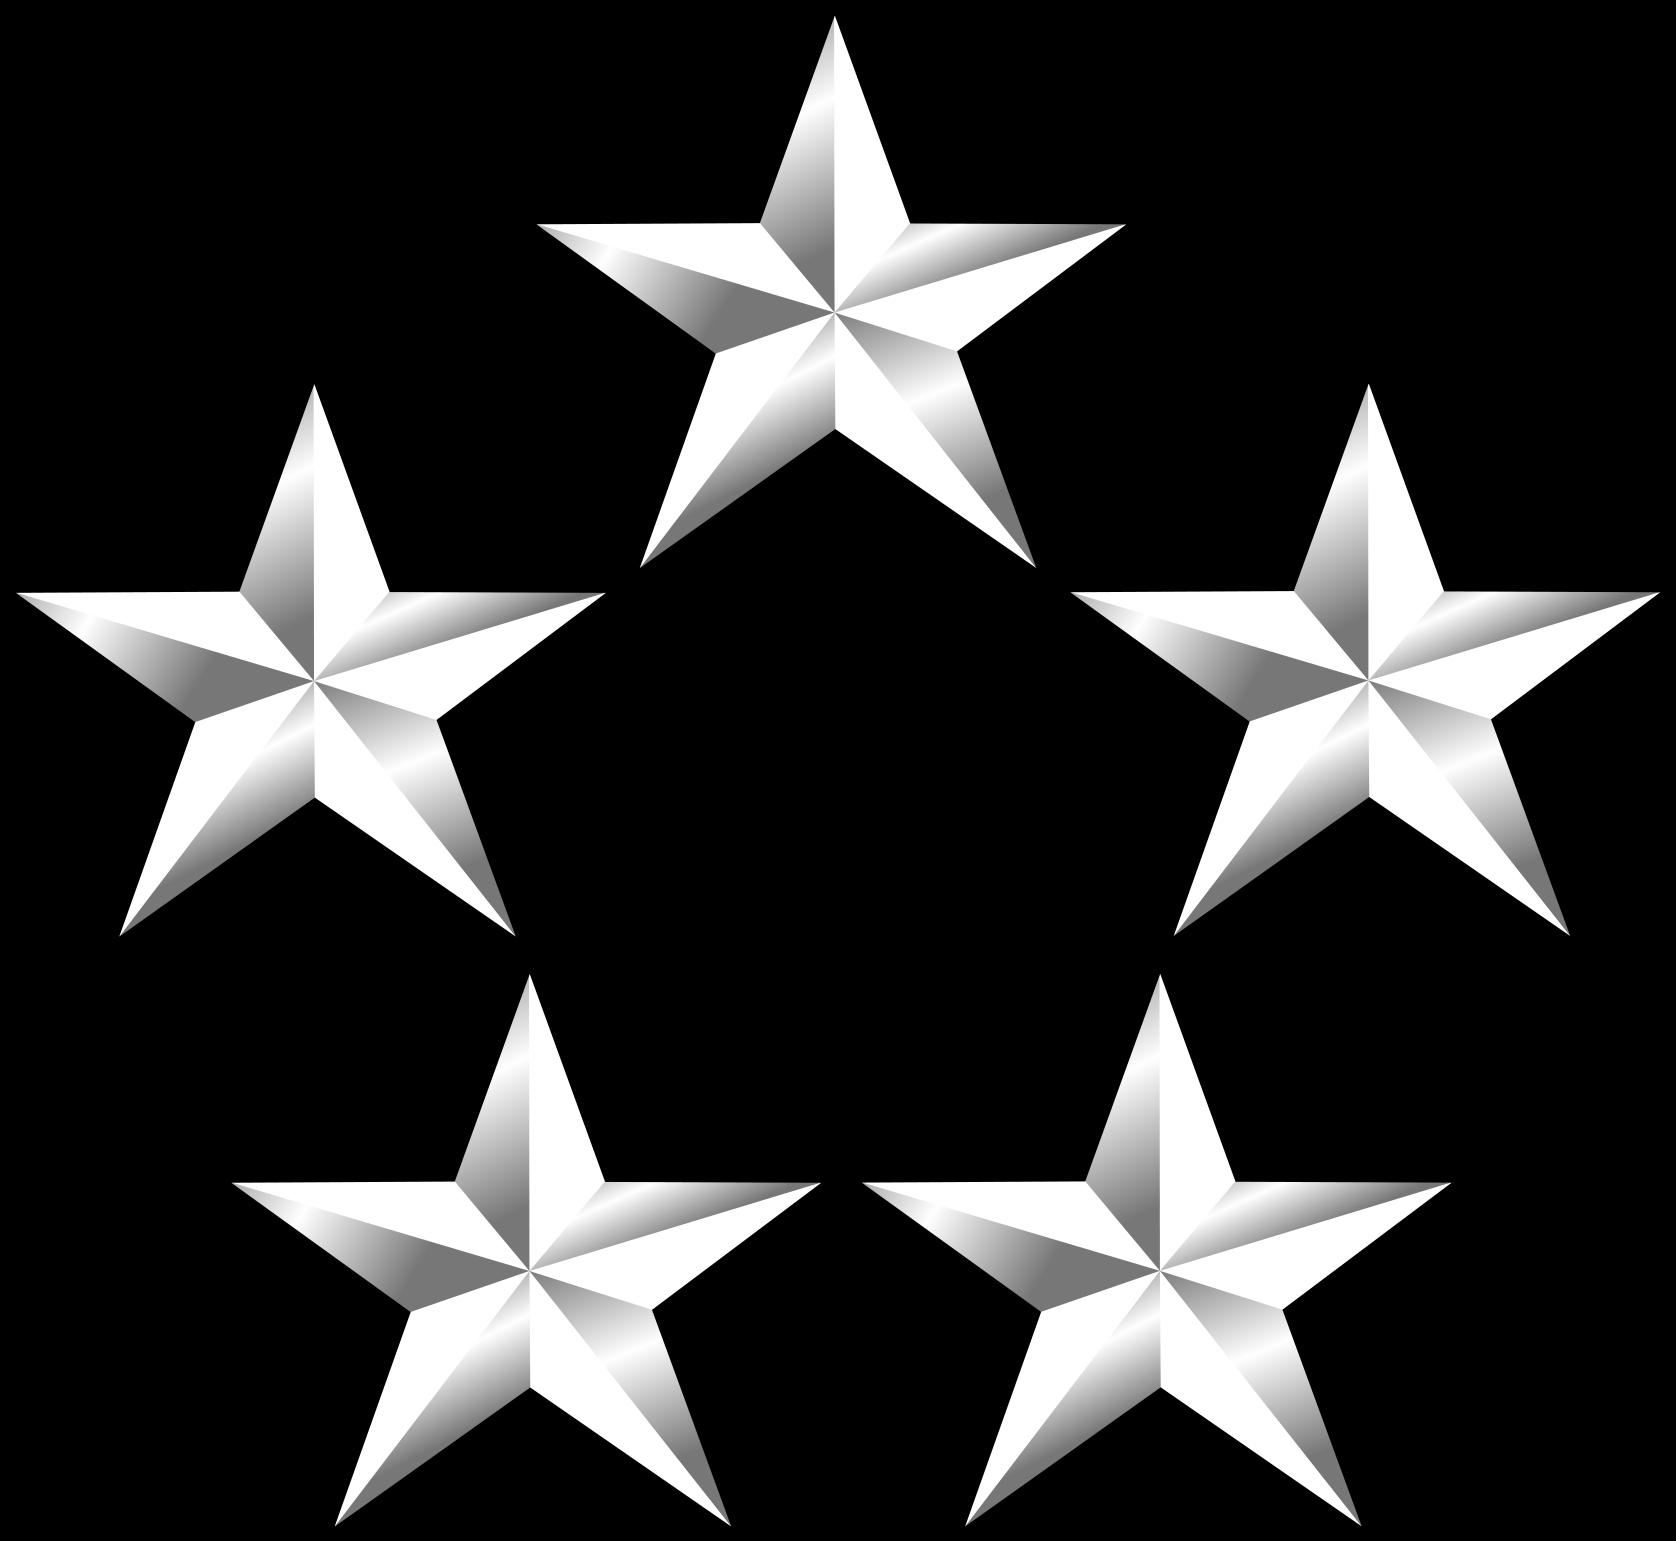 File:5 Star.png.